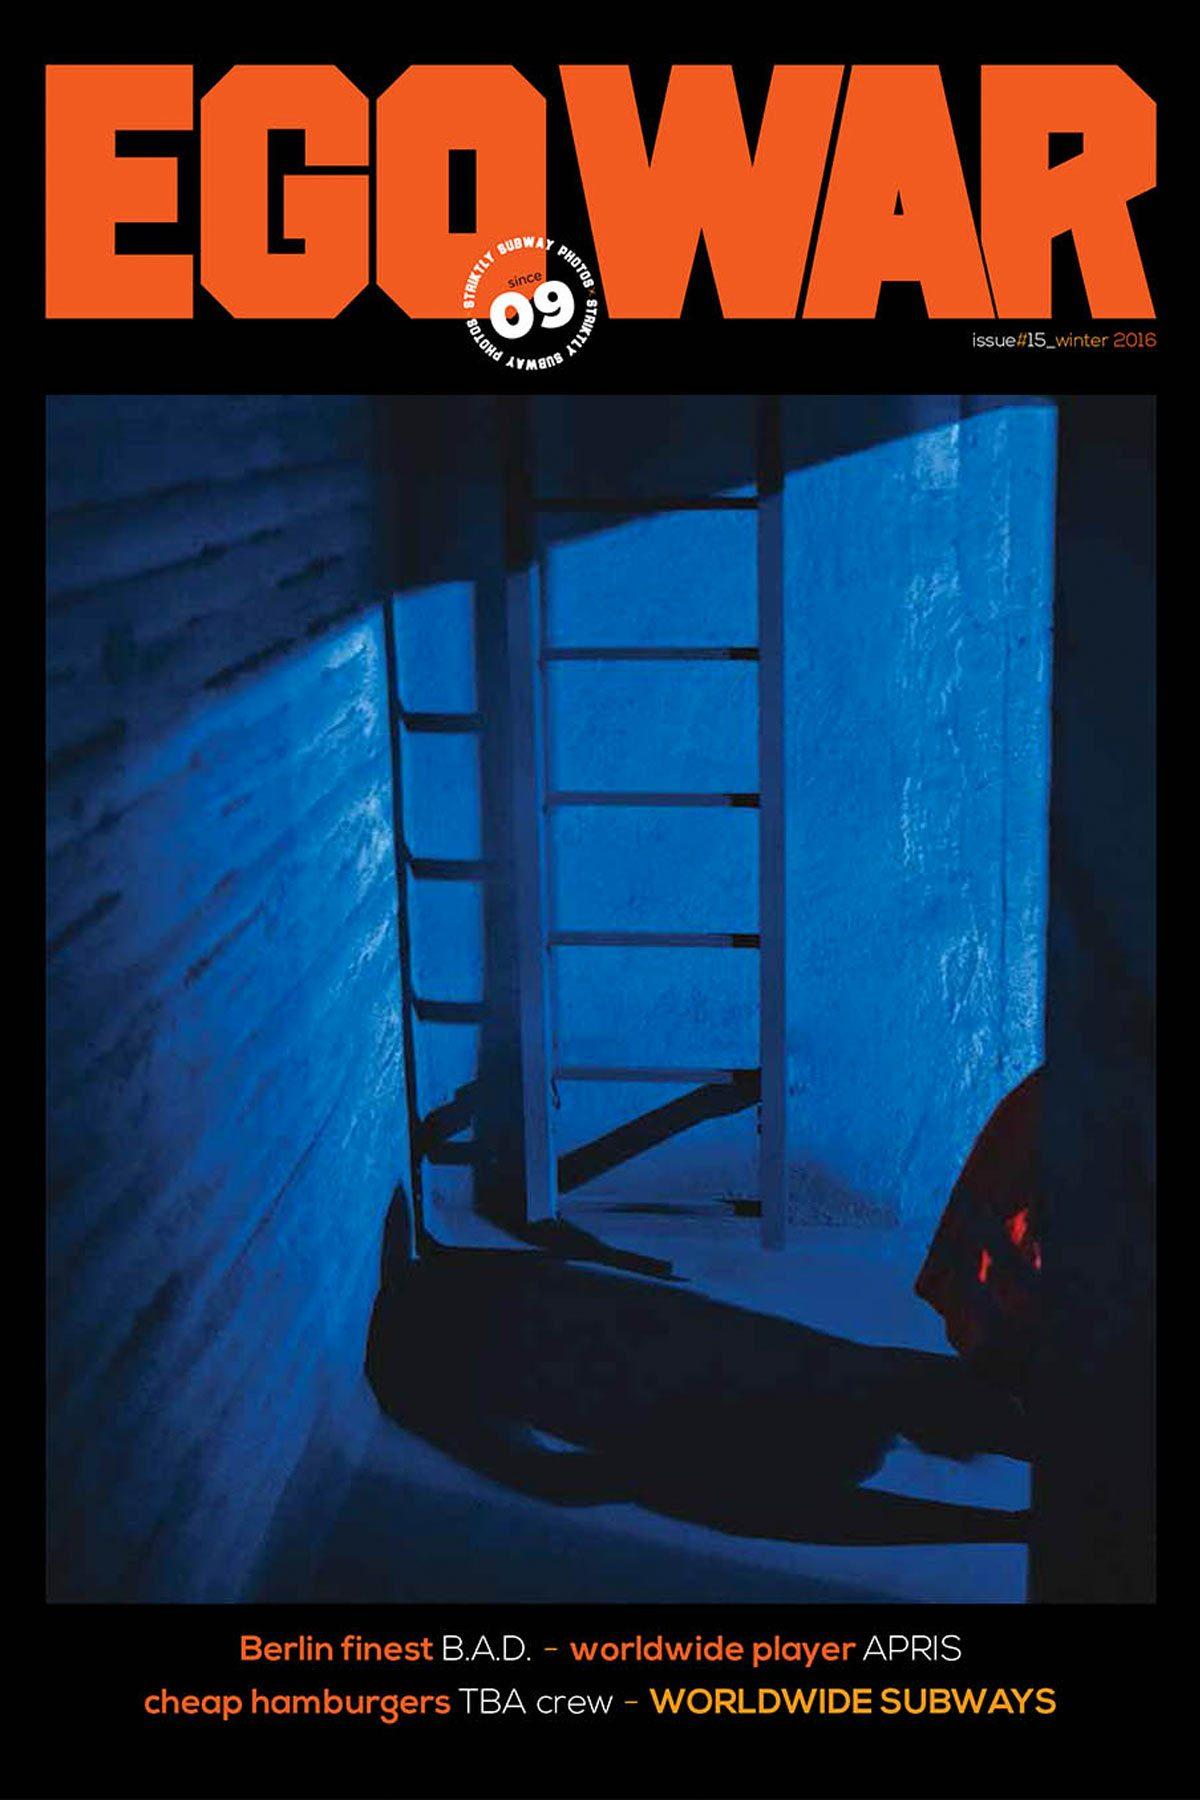 EGOWAR Magazine 15